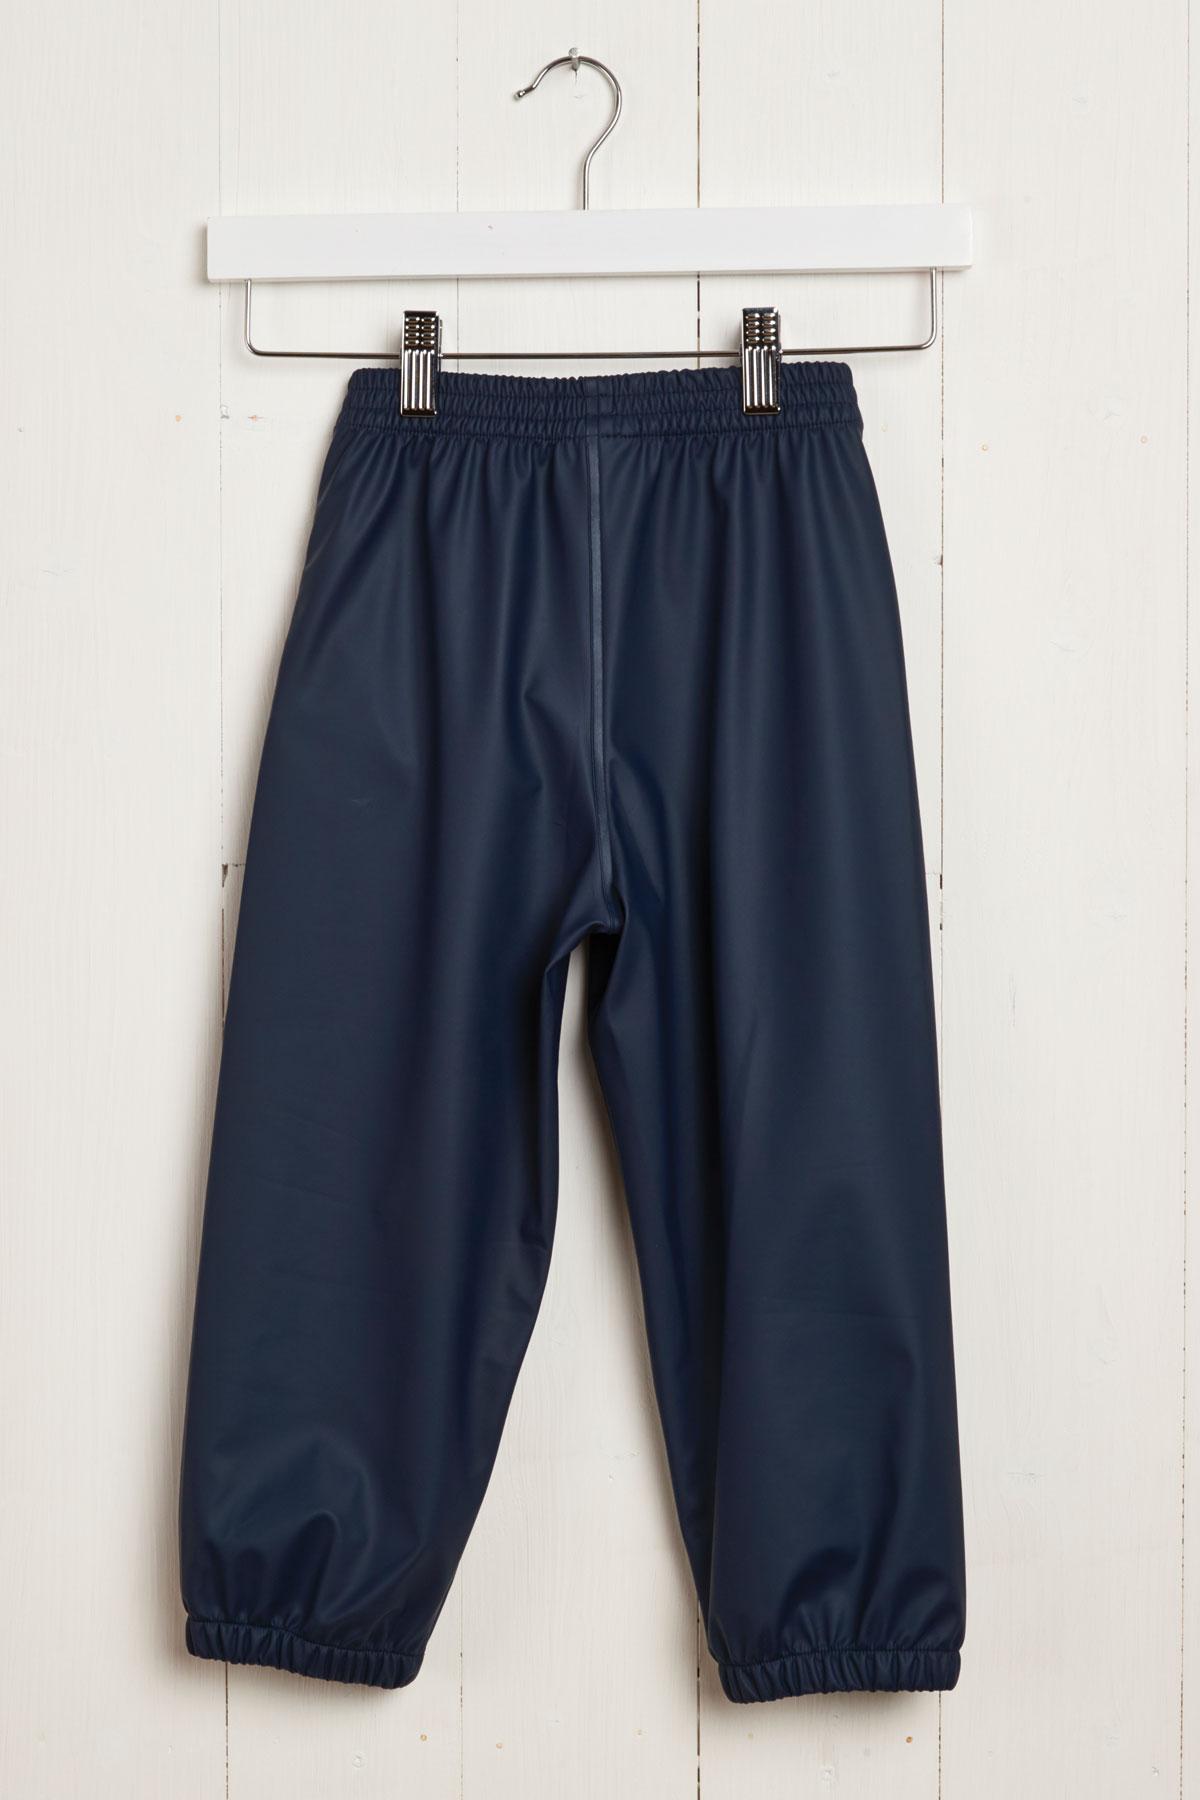 children's waterproof trousers: Grass & Air navy Rain Runners